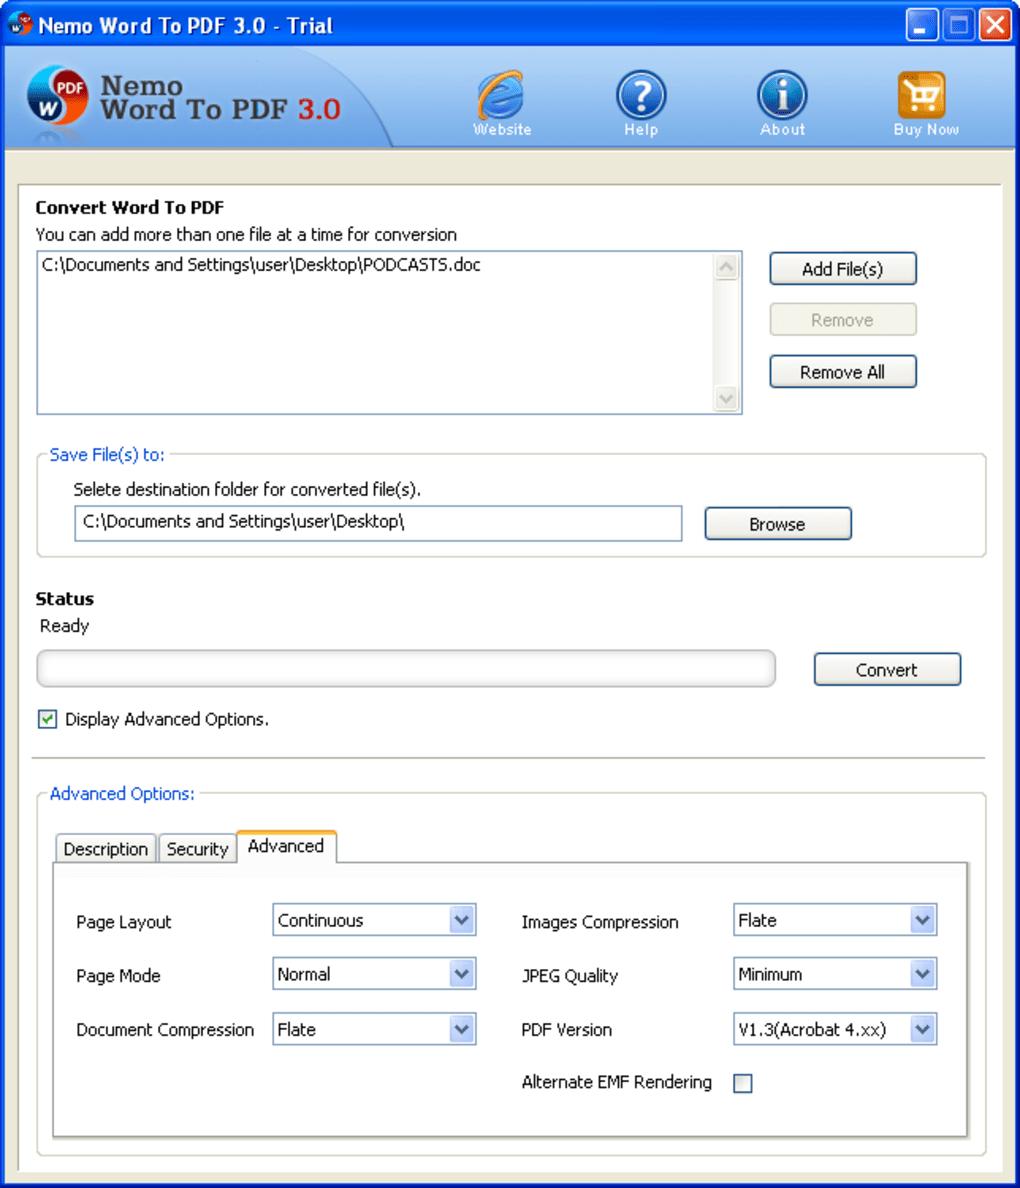 Nemo PDF Converter 5.0